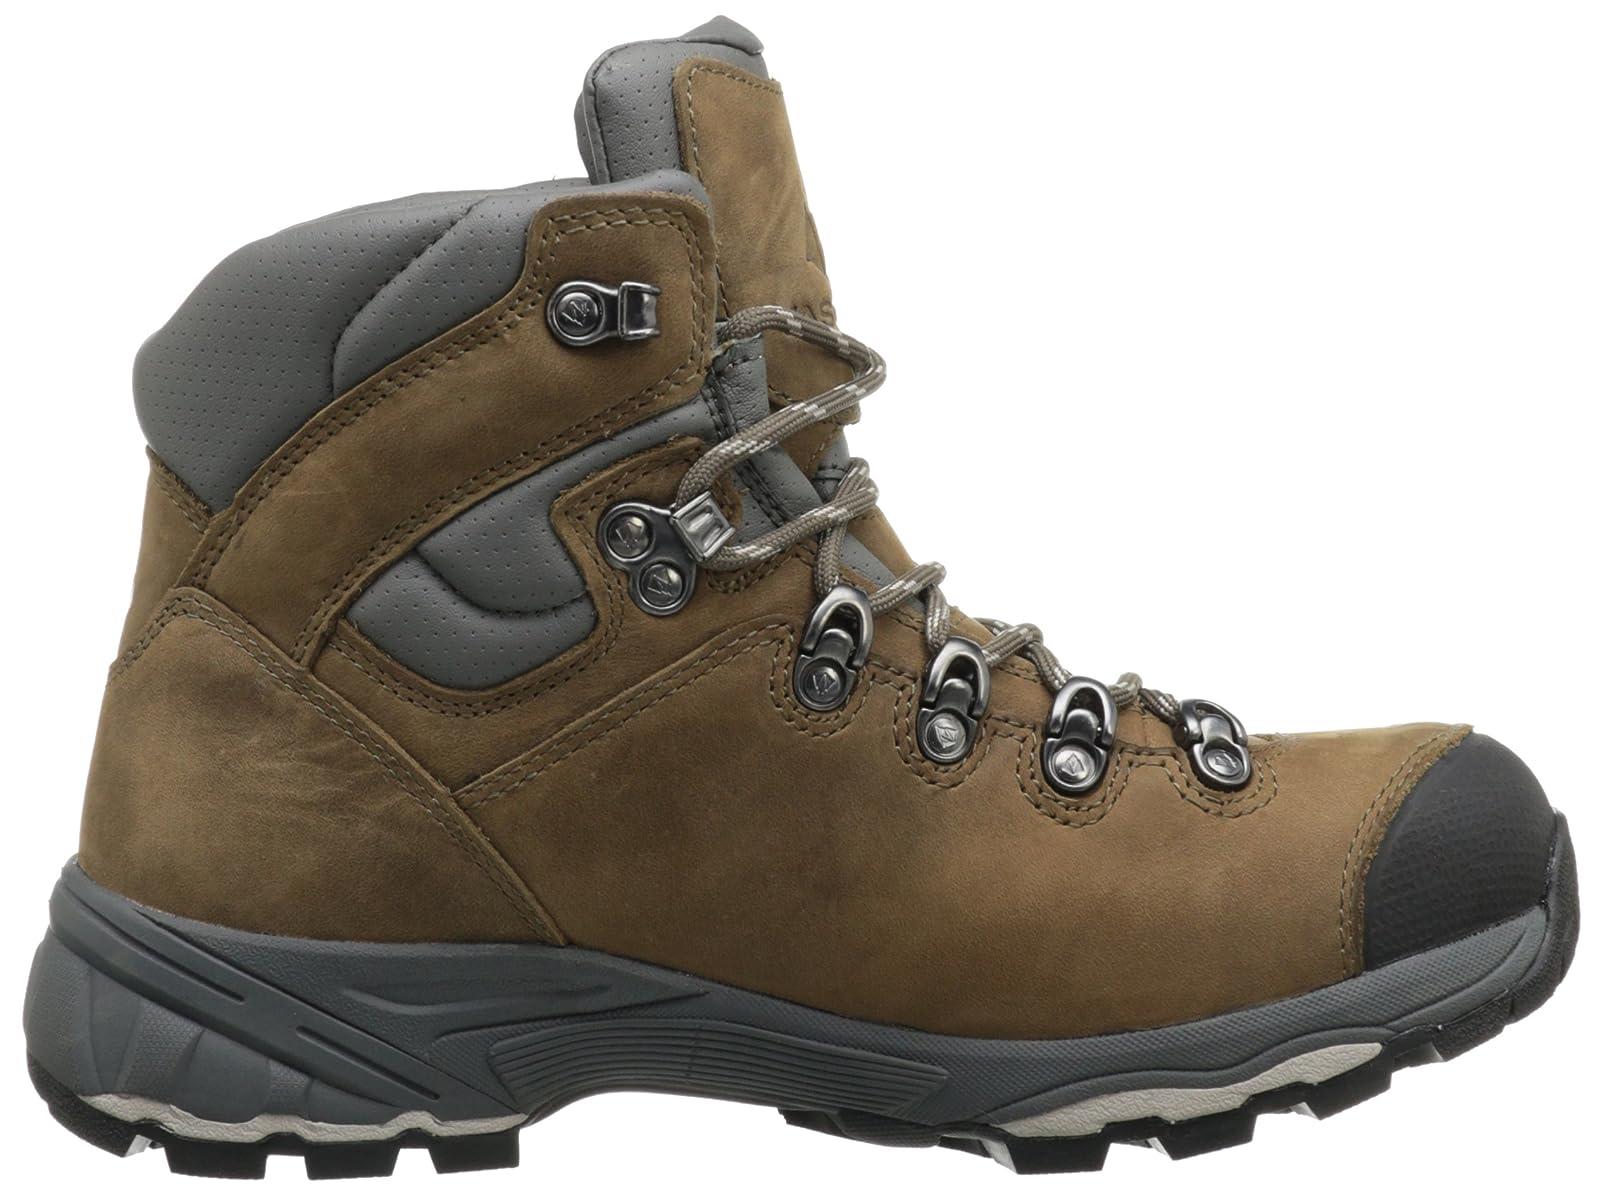 Vasque Women's St. Elias Gore-Tex Hiking Boot 8 M US Women - 12